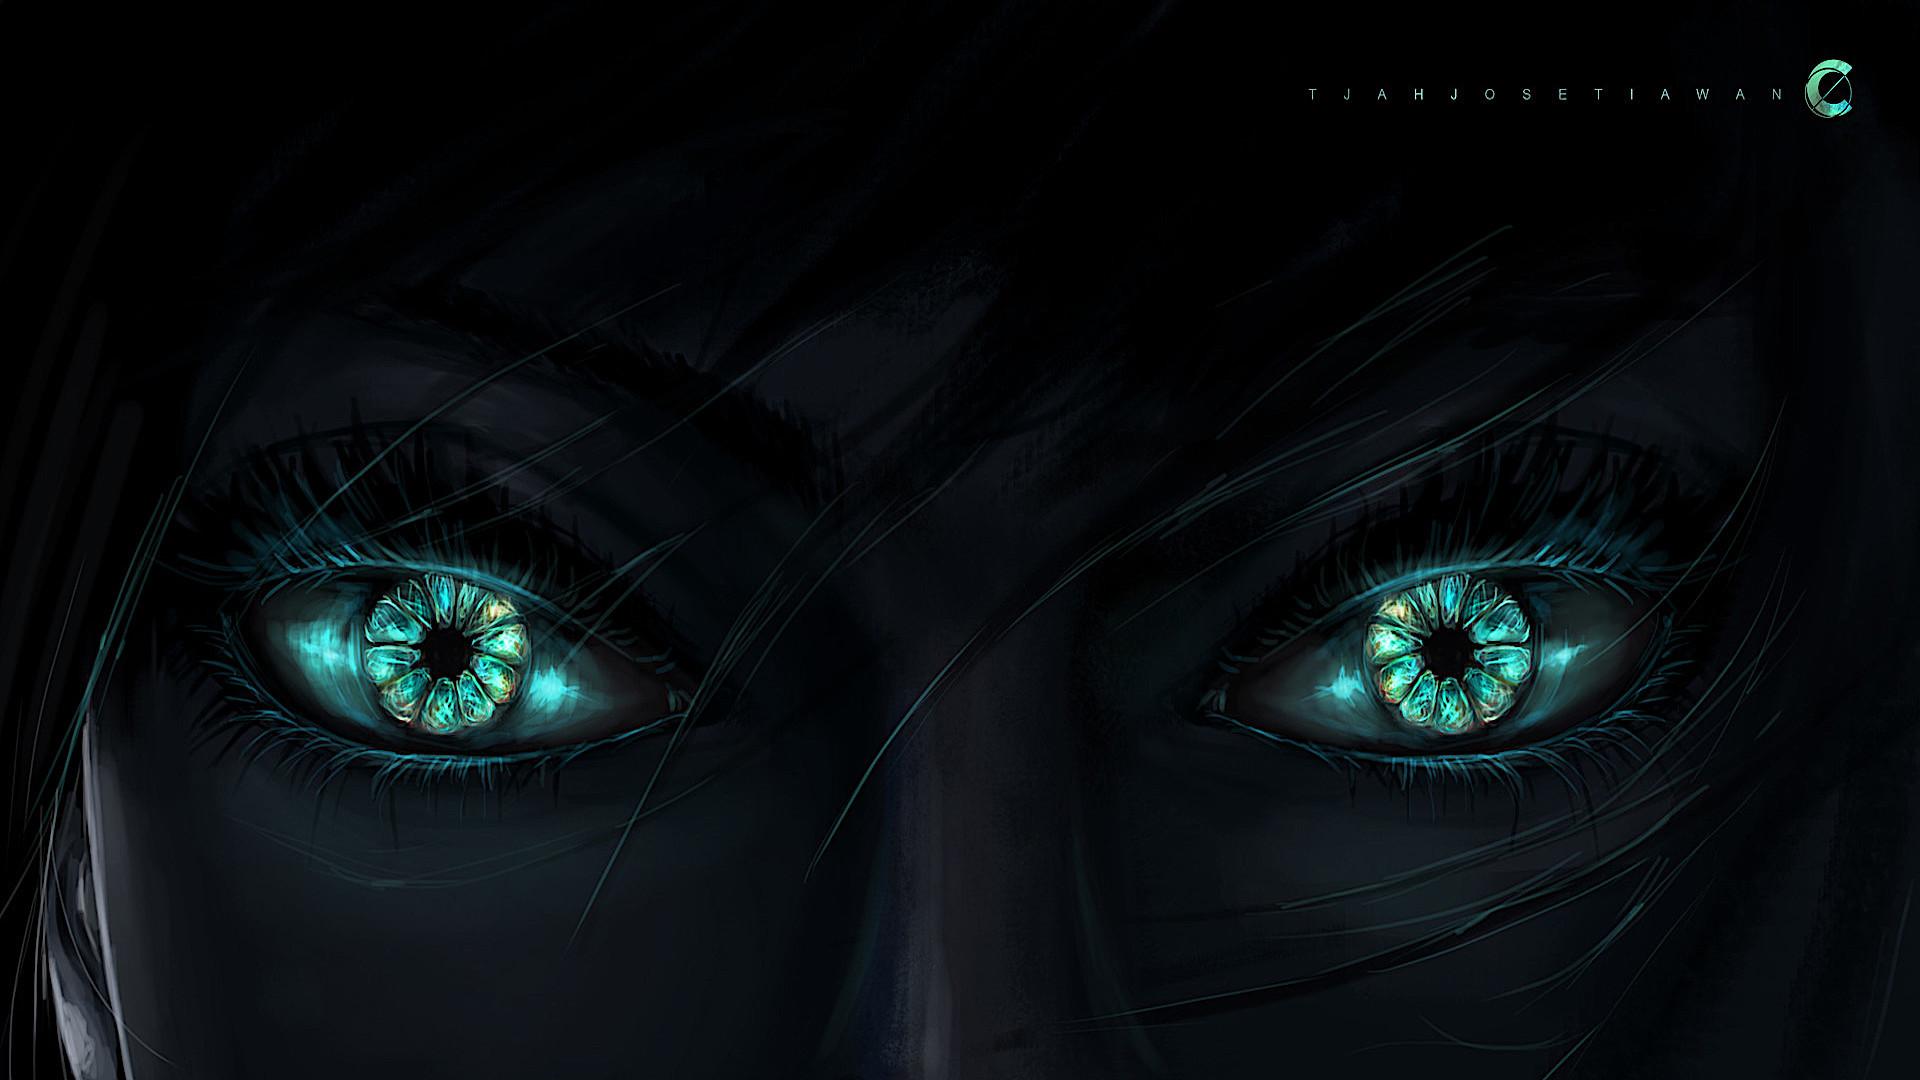 1920x1200 Dark Green Eyes 1200p Wallpaper Hd Artist 4k